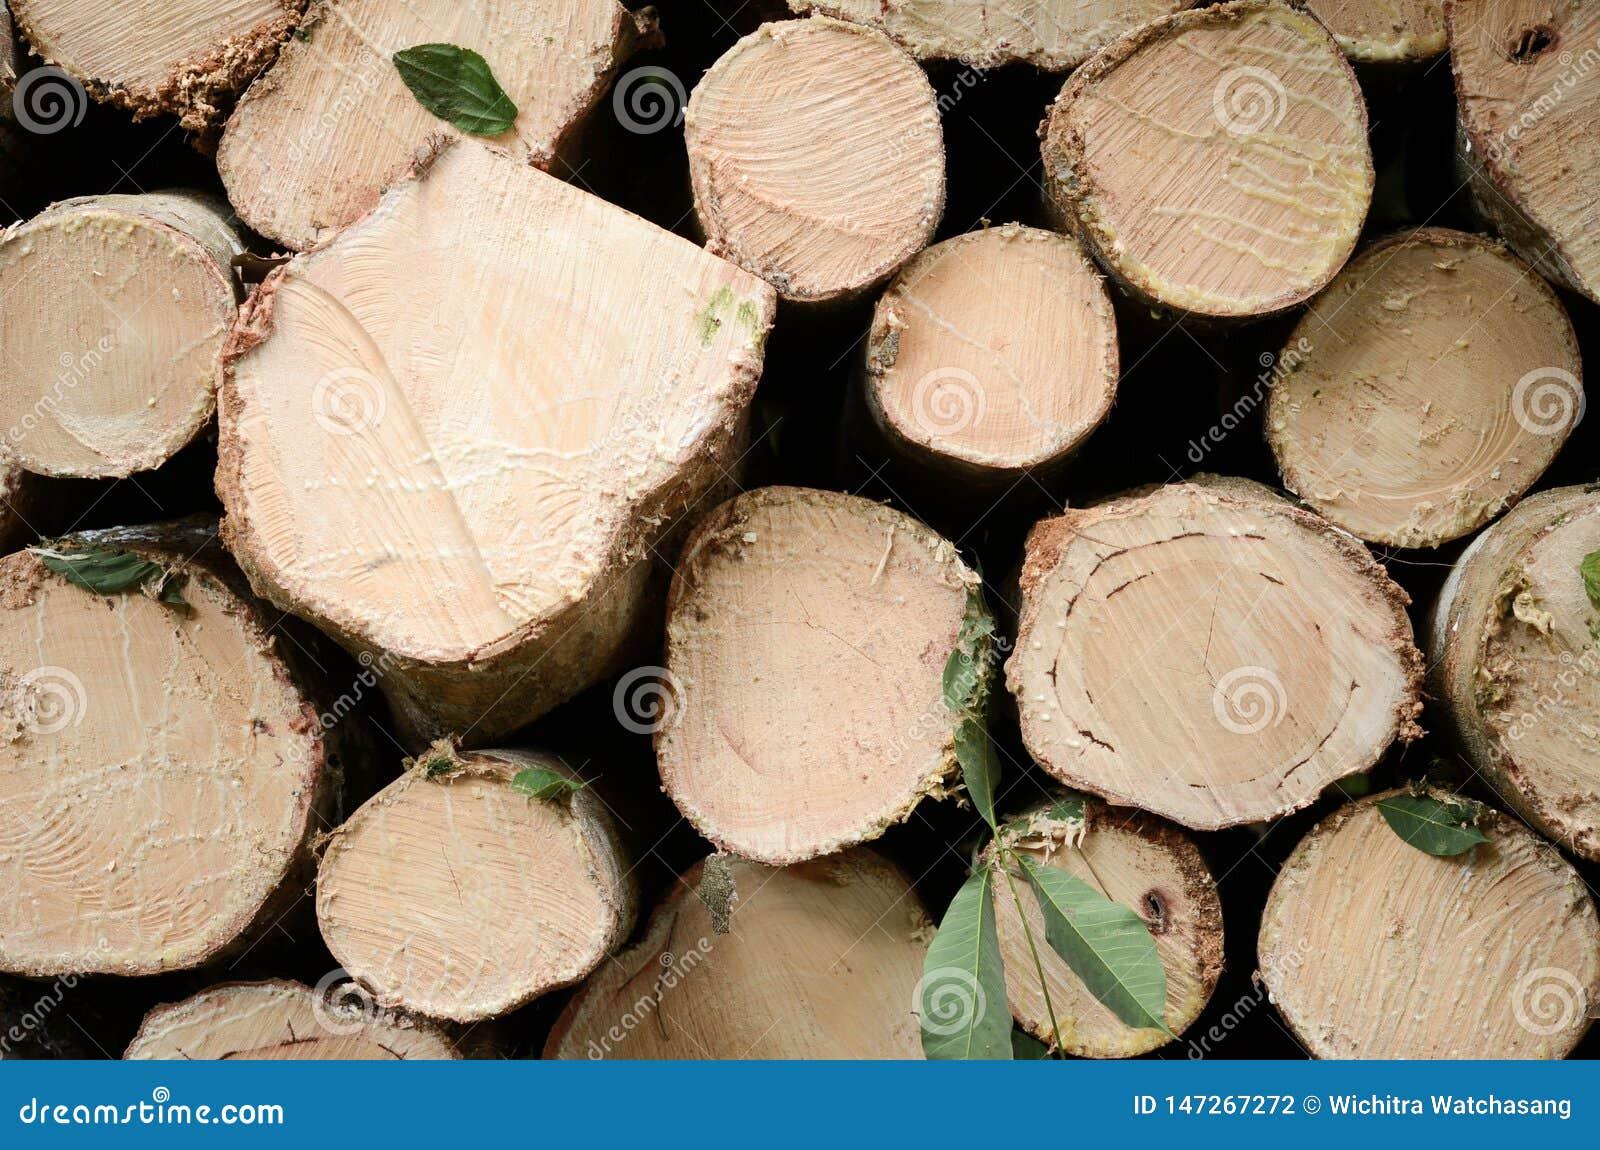 Natural de madera fresco aserr? un primer de los registros